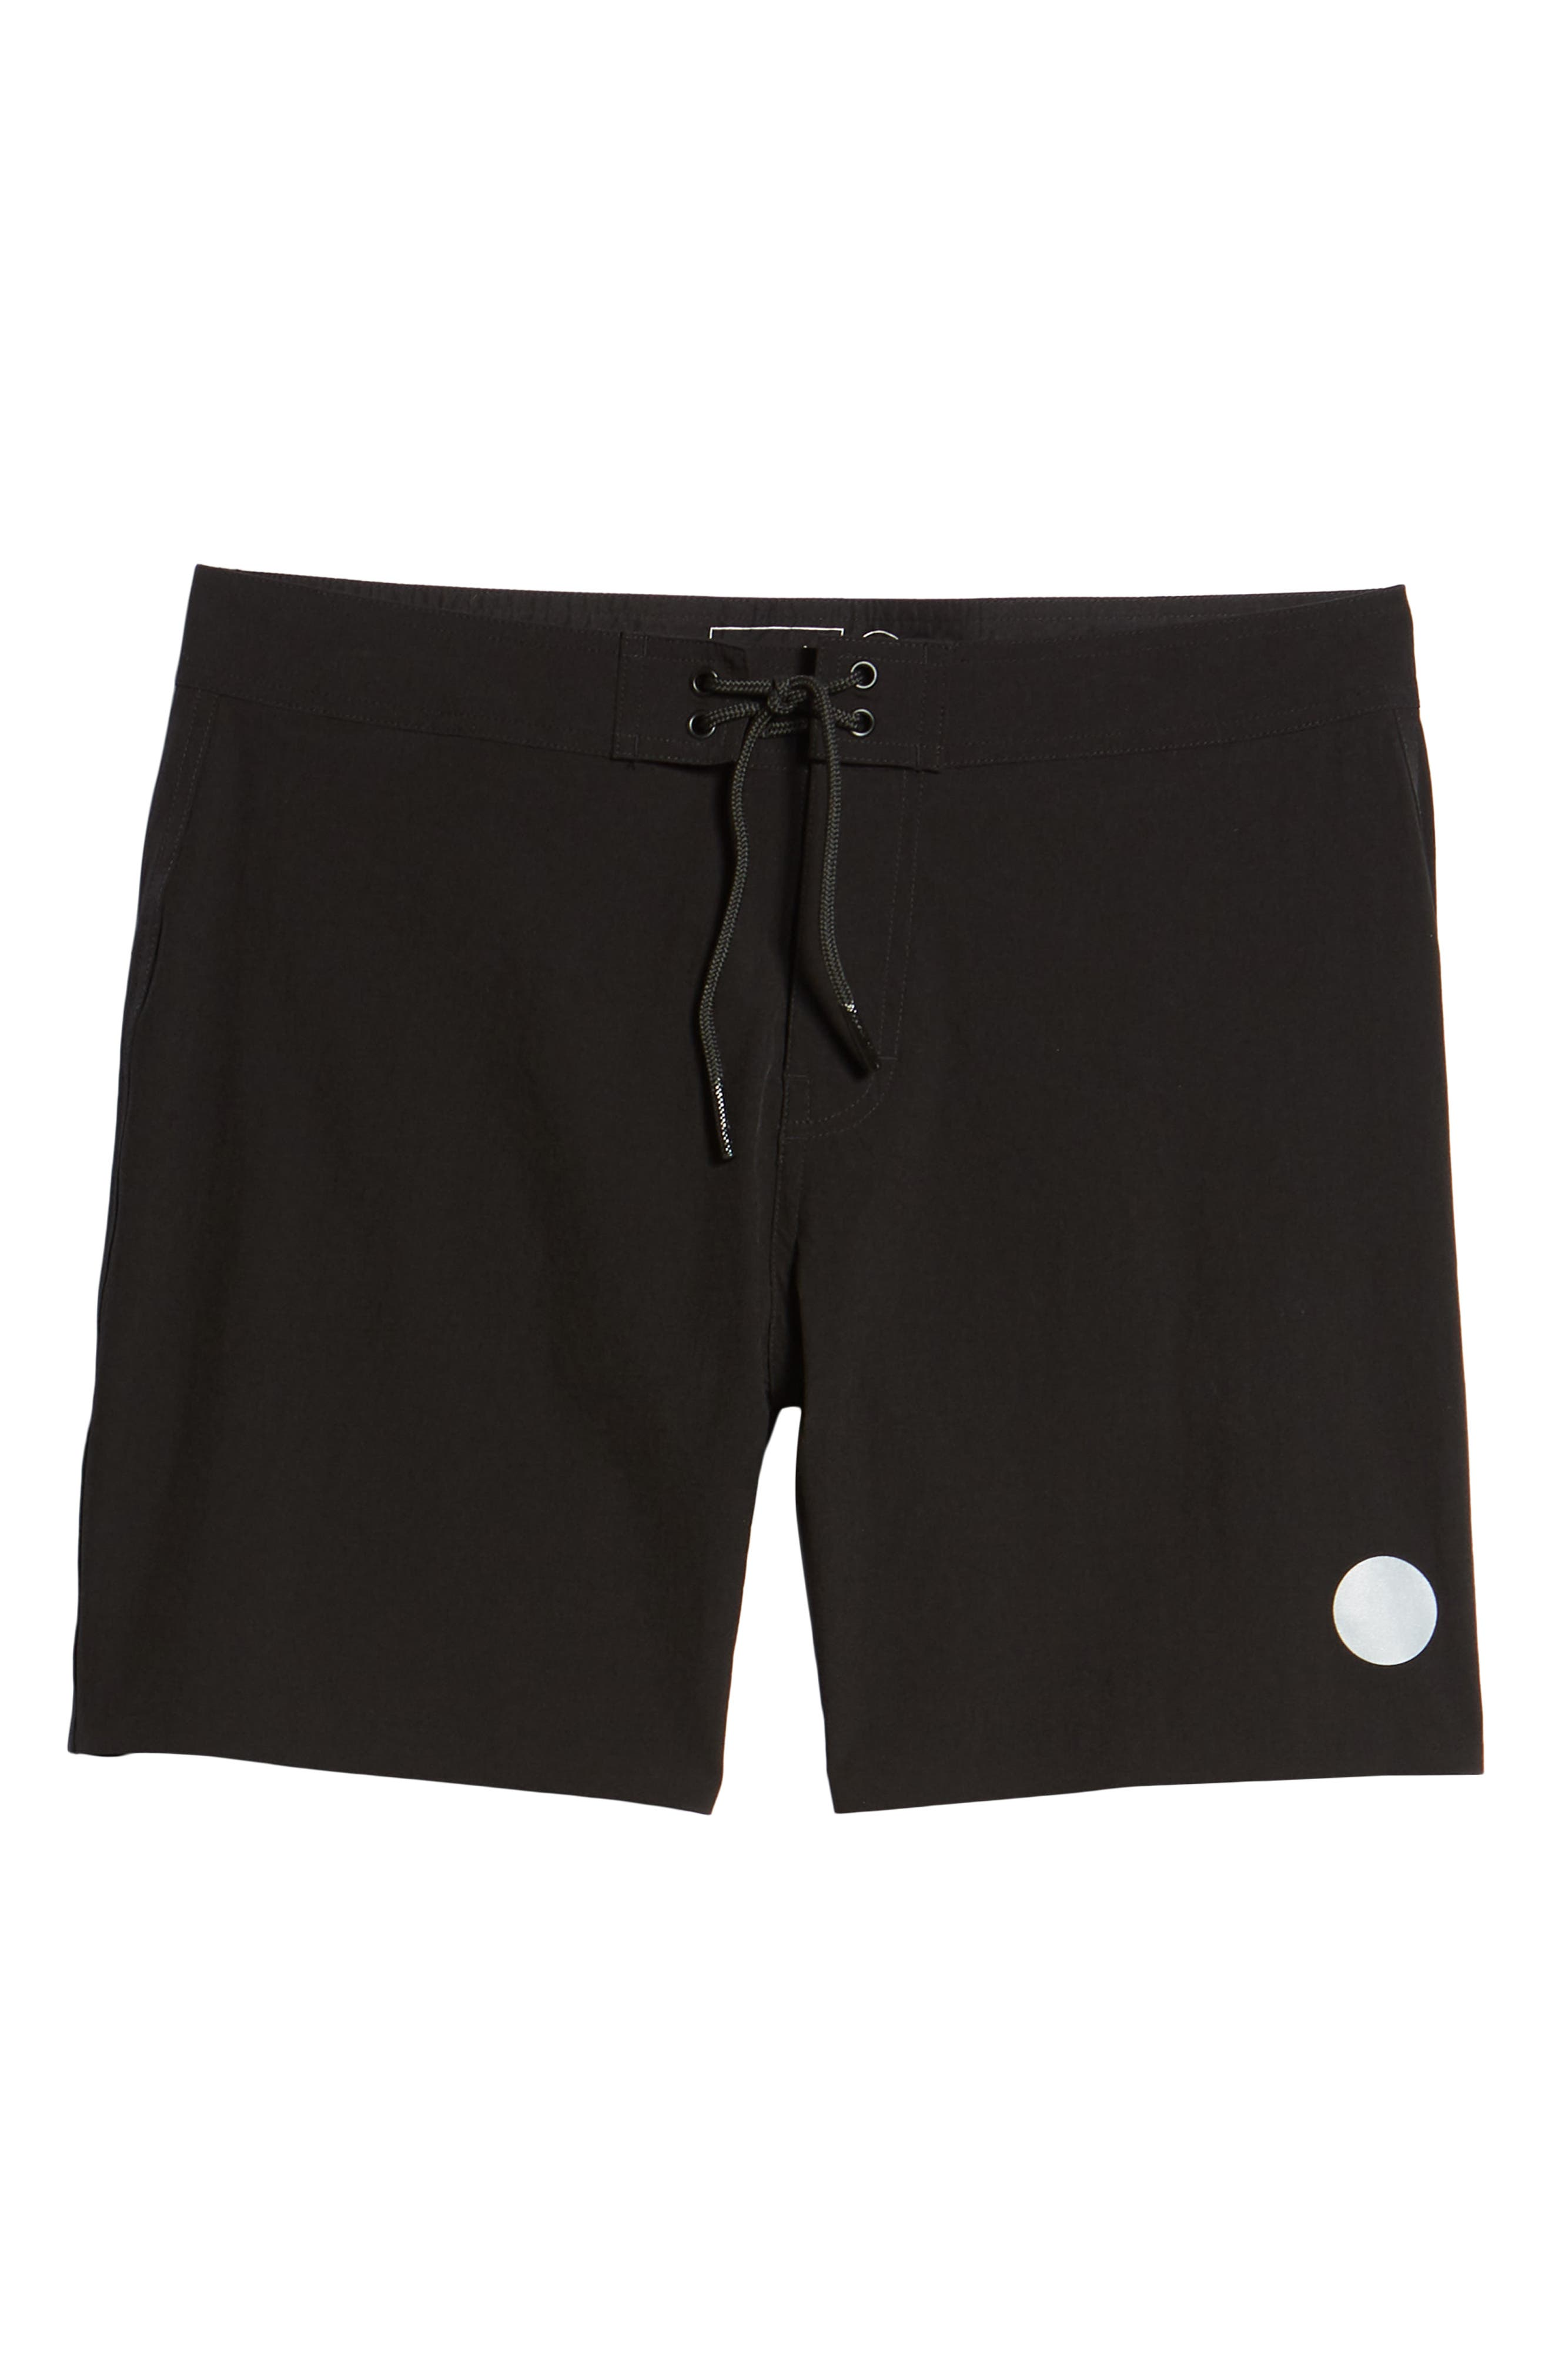 Danny Board Shorts,                             Alternate thumbnail 6, color,                             Black